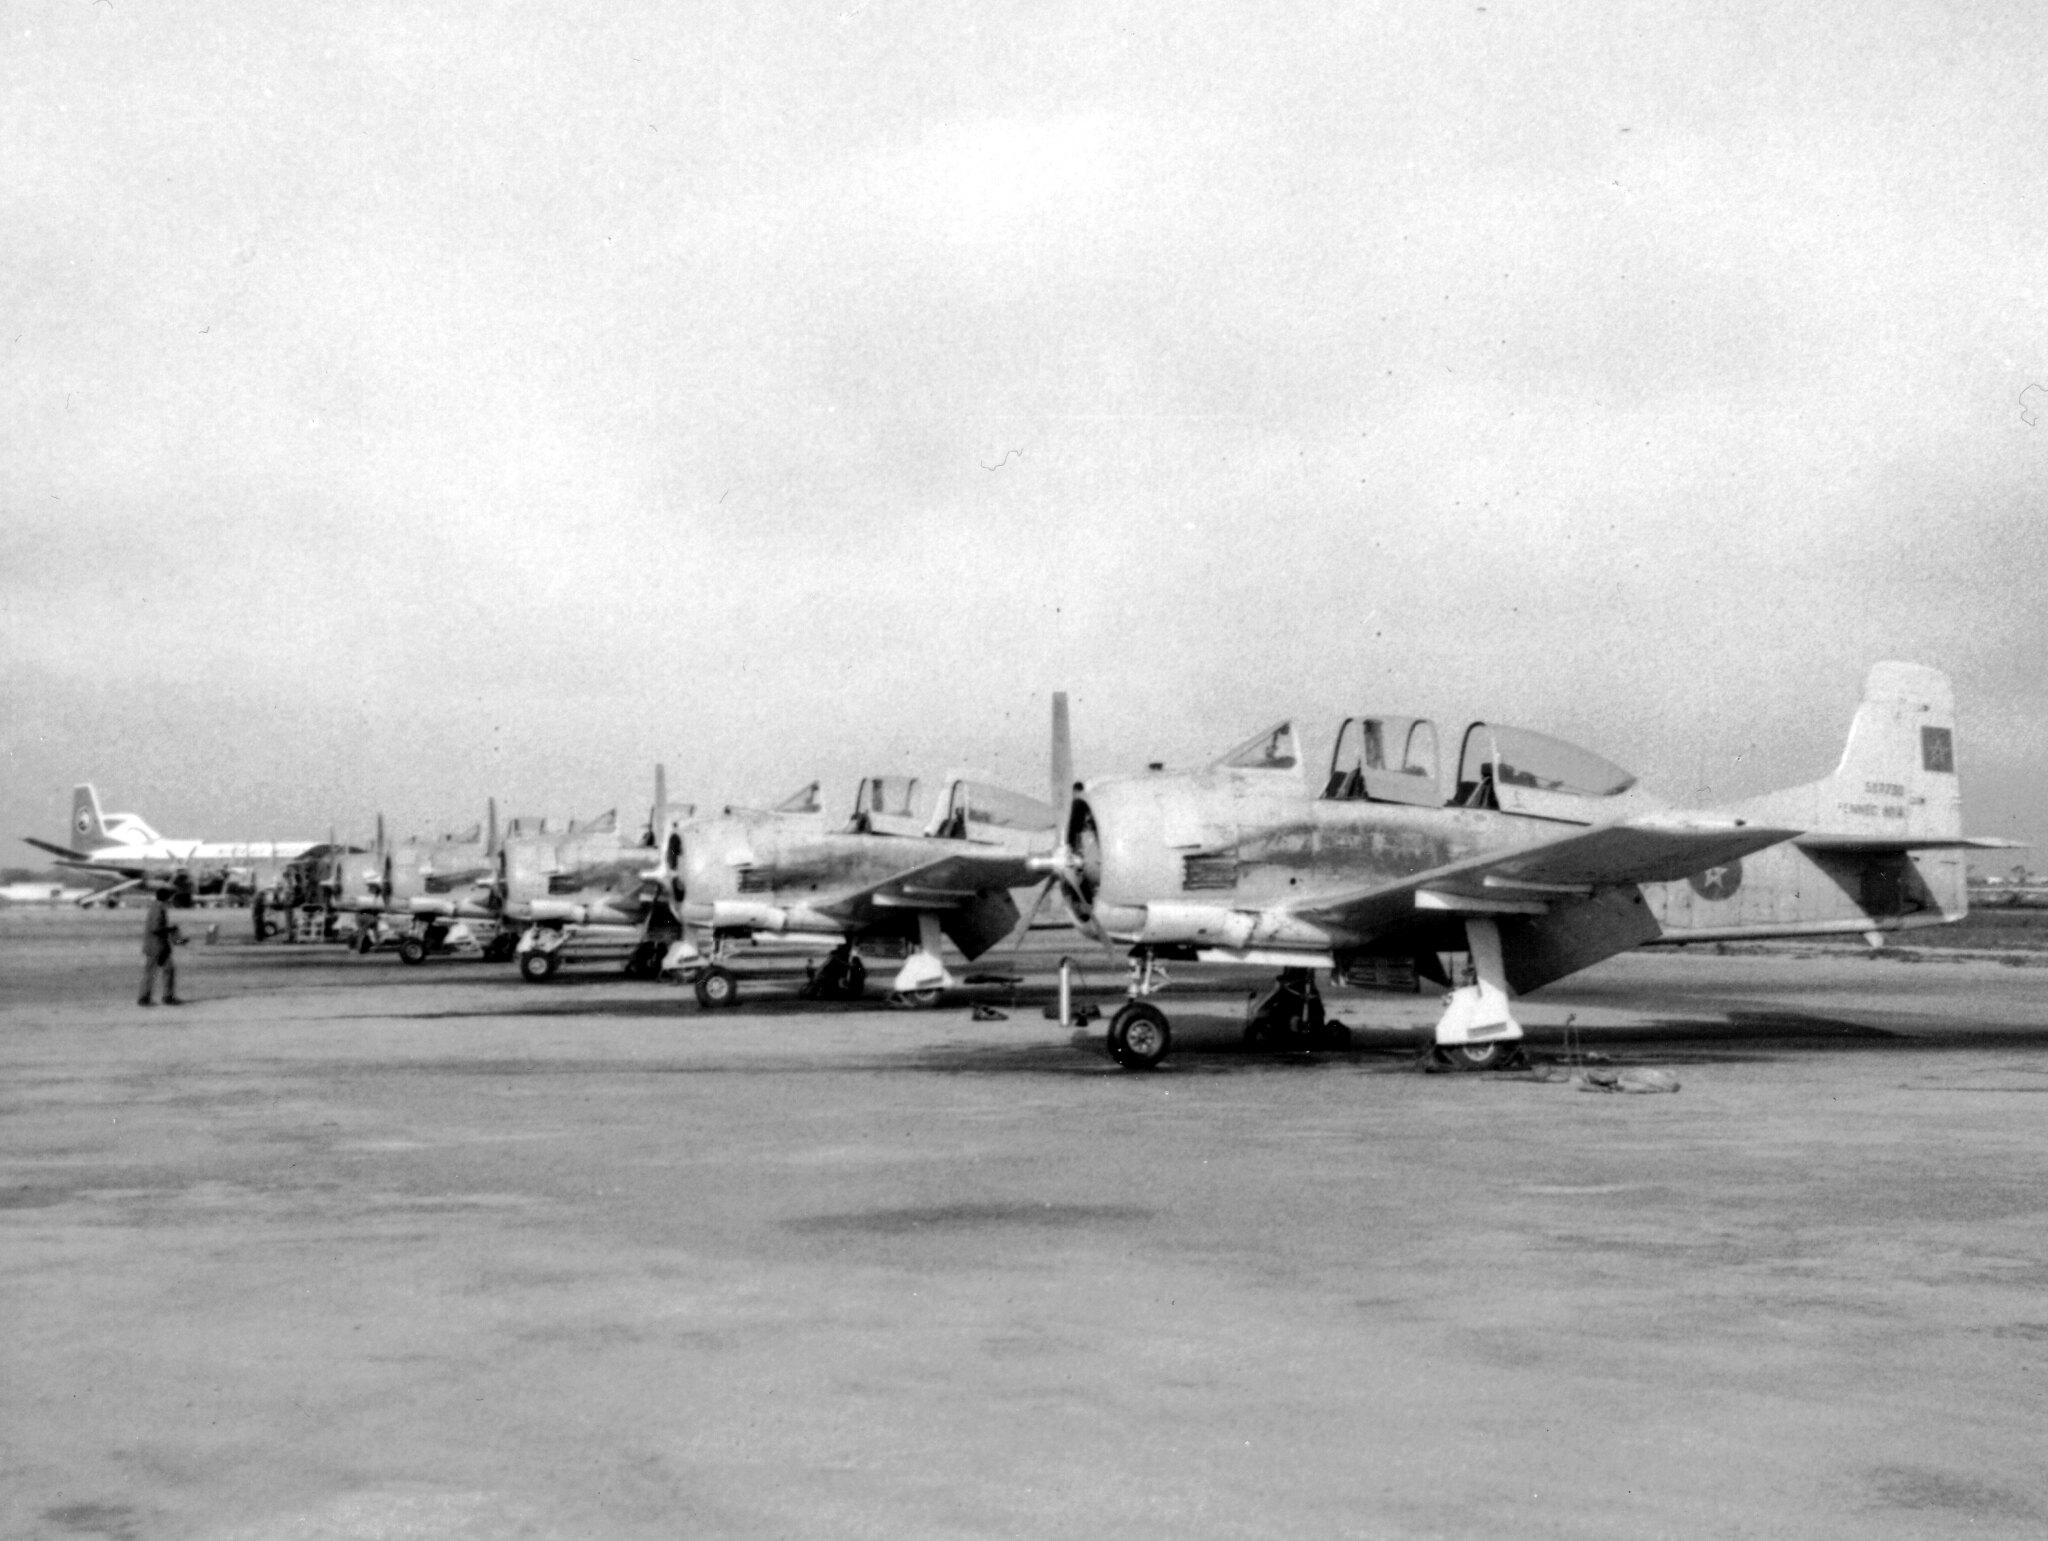 FRA: Photos anciens avions des FRA - Page 13 49014572681_7eacc65373_k